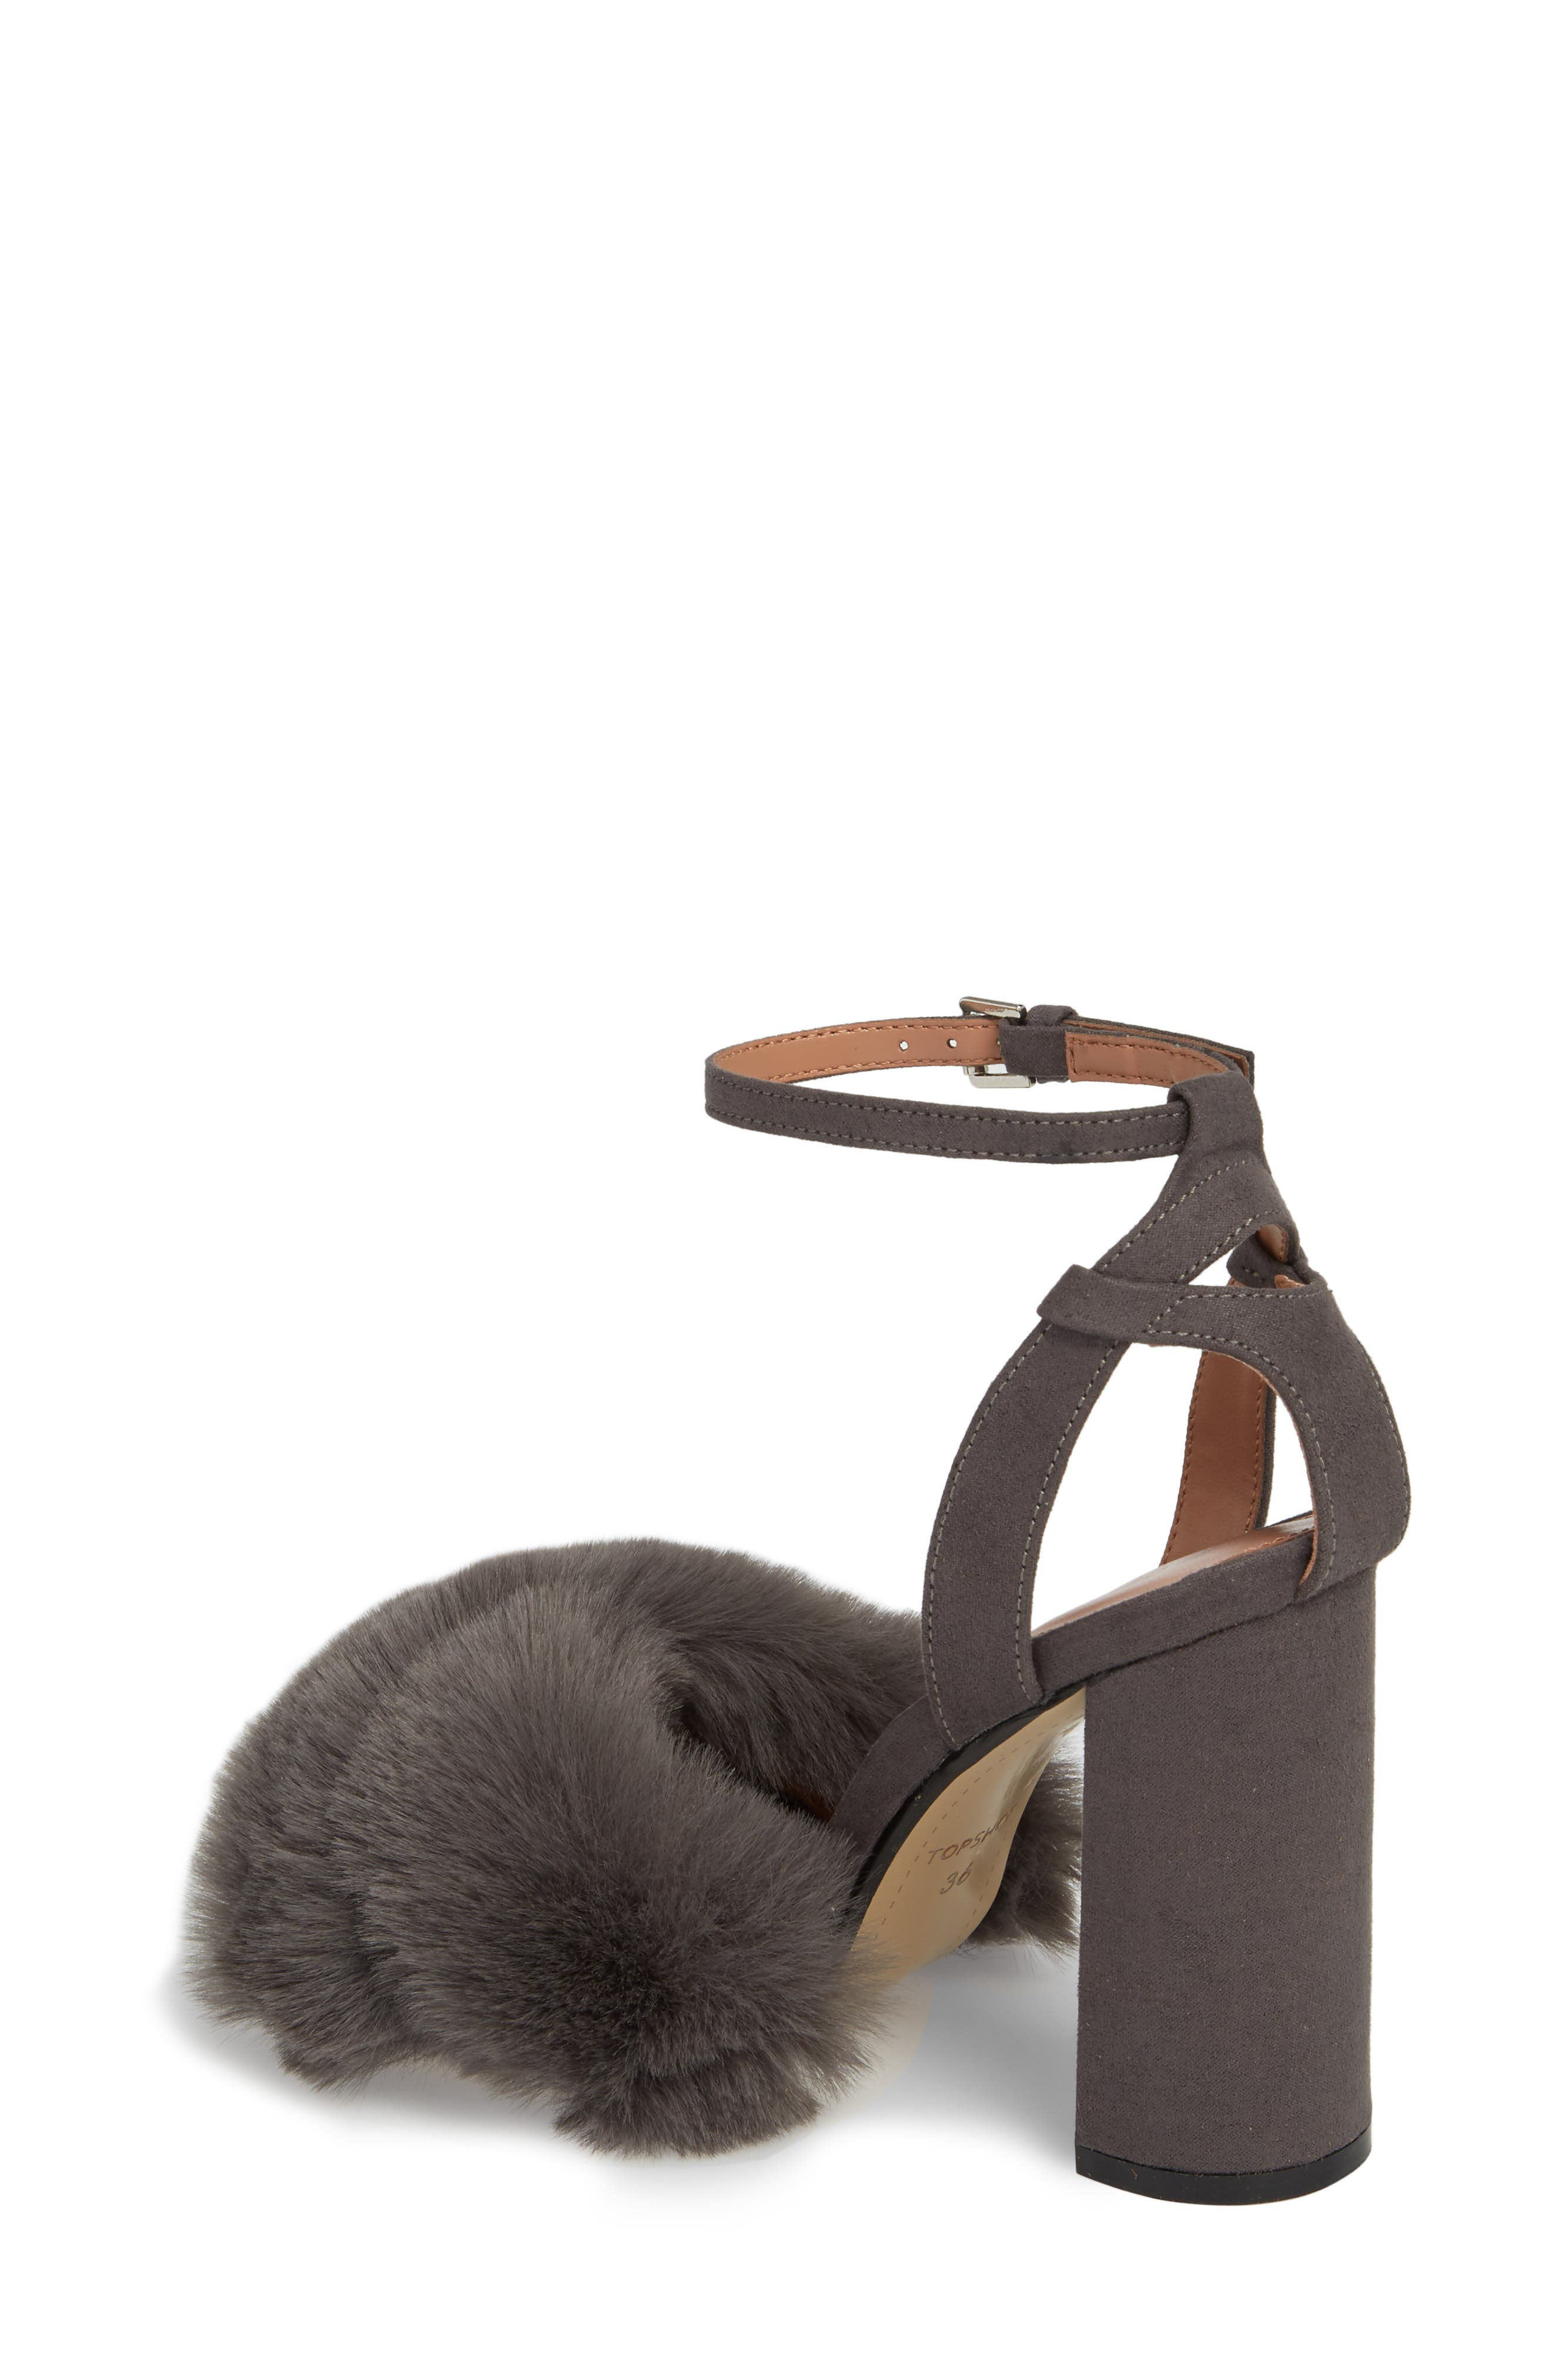 Sassy Faux Fur Sandal,                             Alternate thumbnail 2, color,                             020